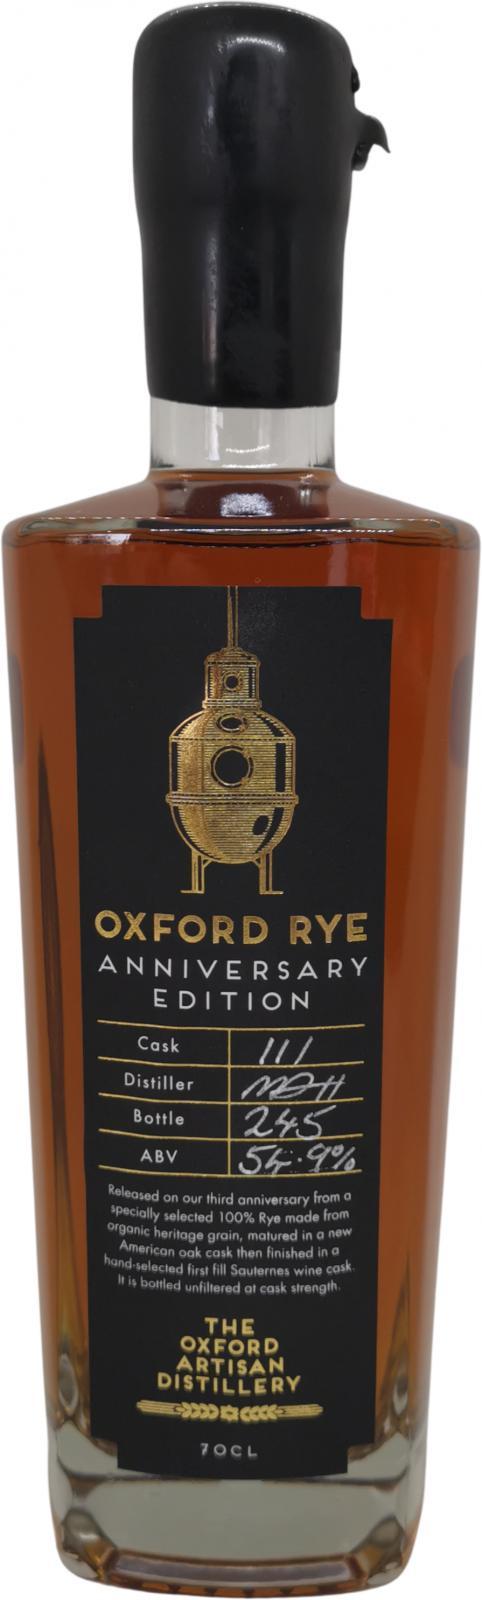 The Oxford Artisan Distillery Oxford Rye